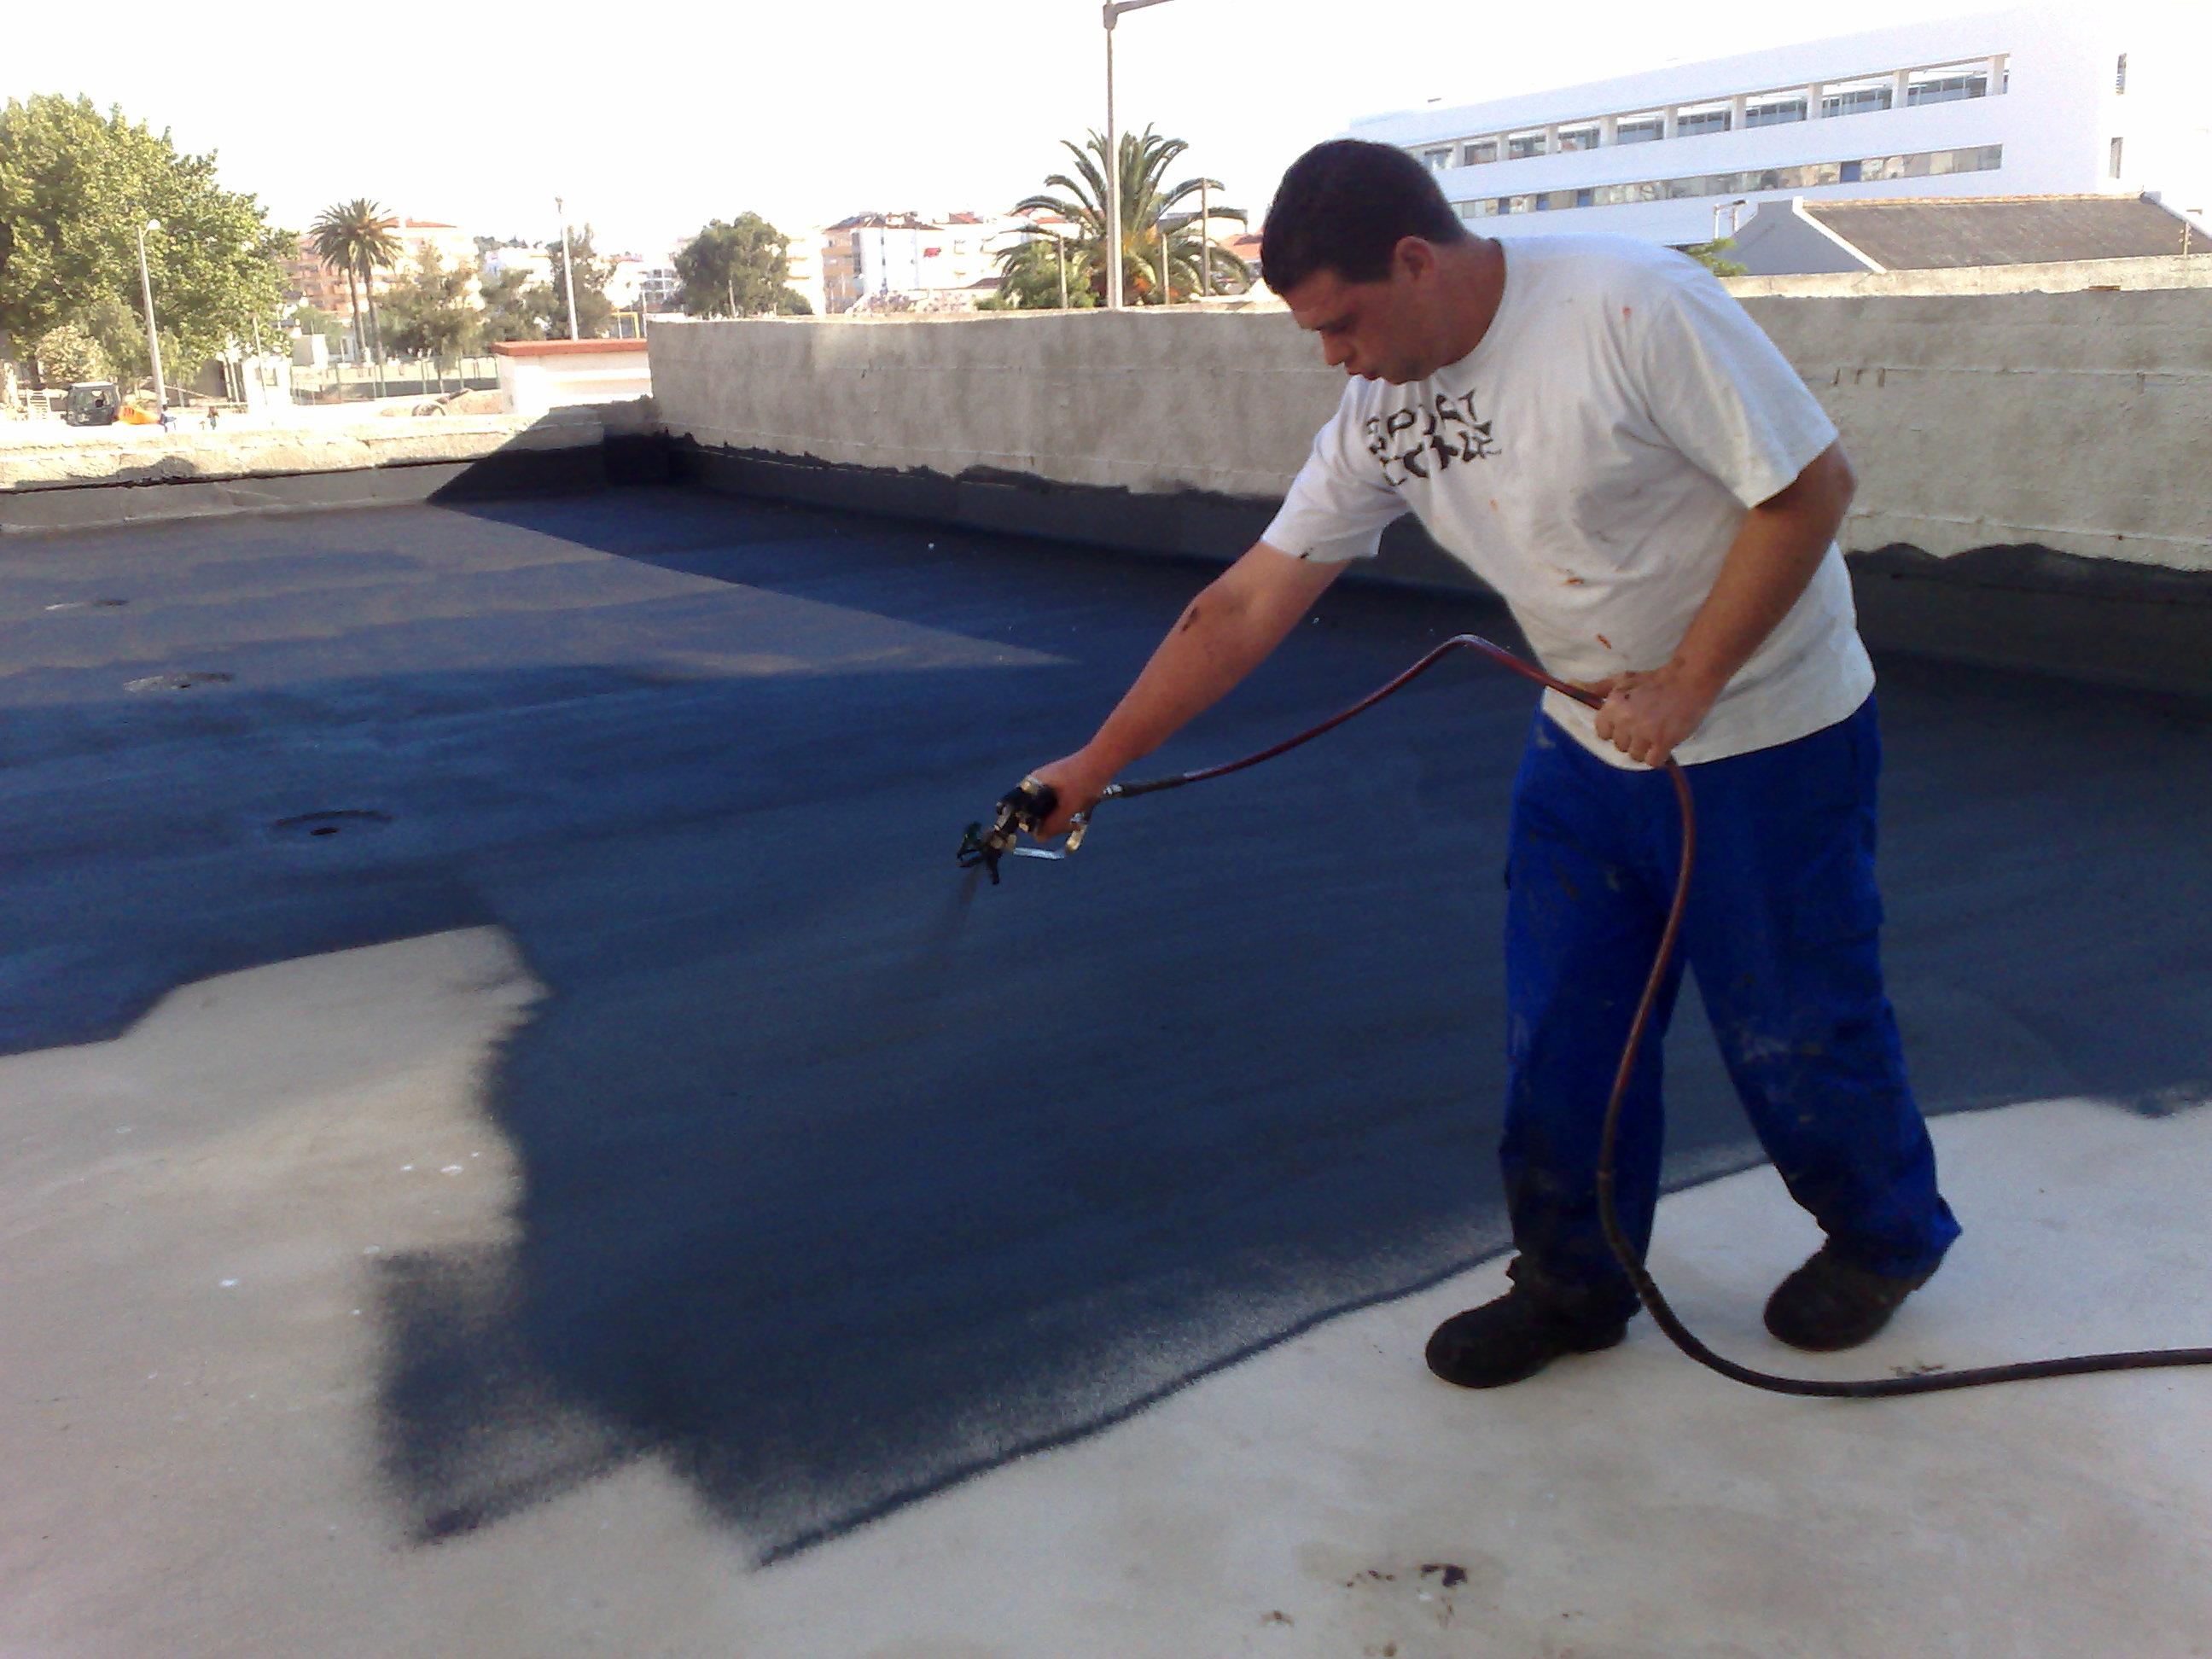 Impermeabiliza o e inje o proiber - Impermeabilizante para paredes ...